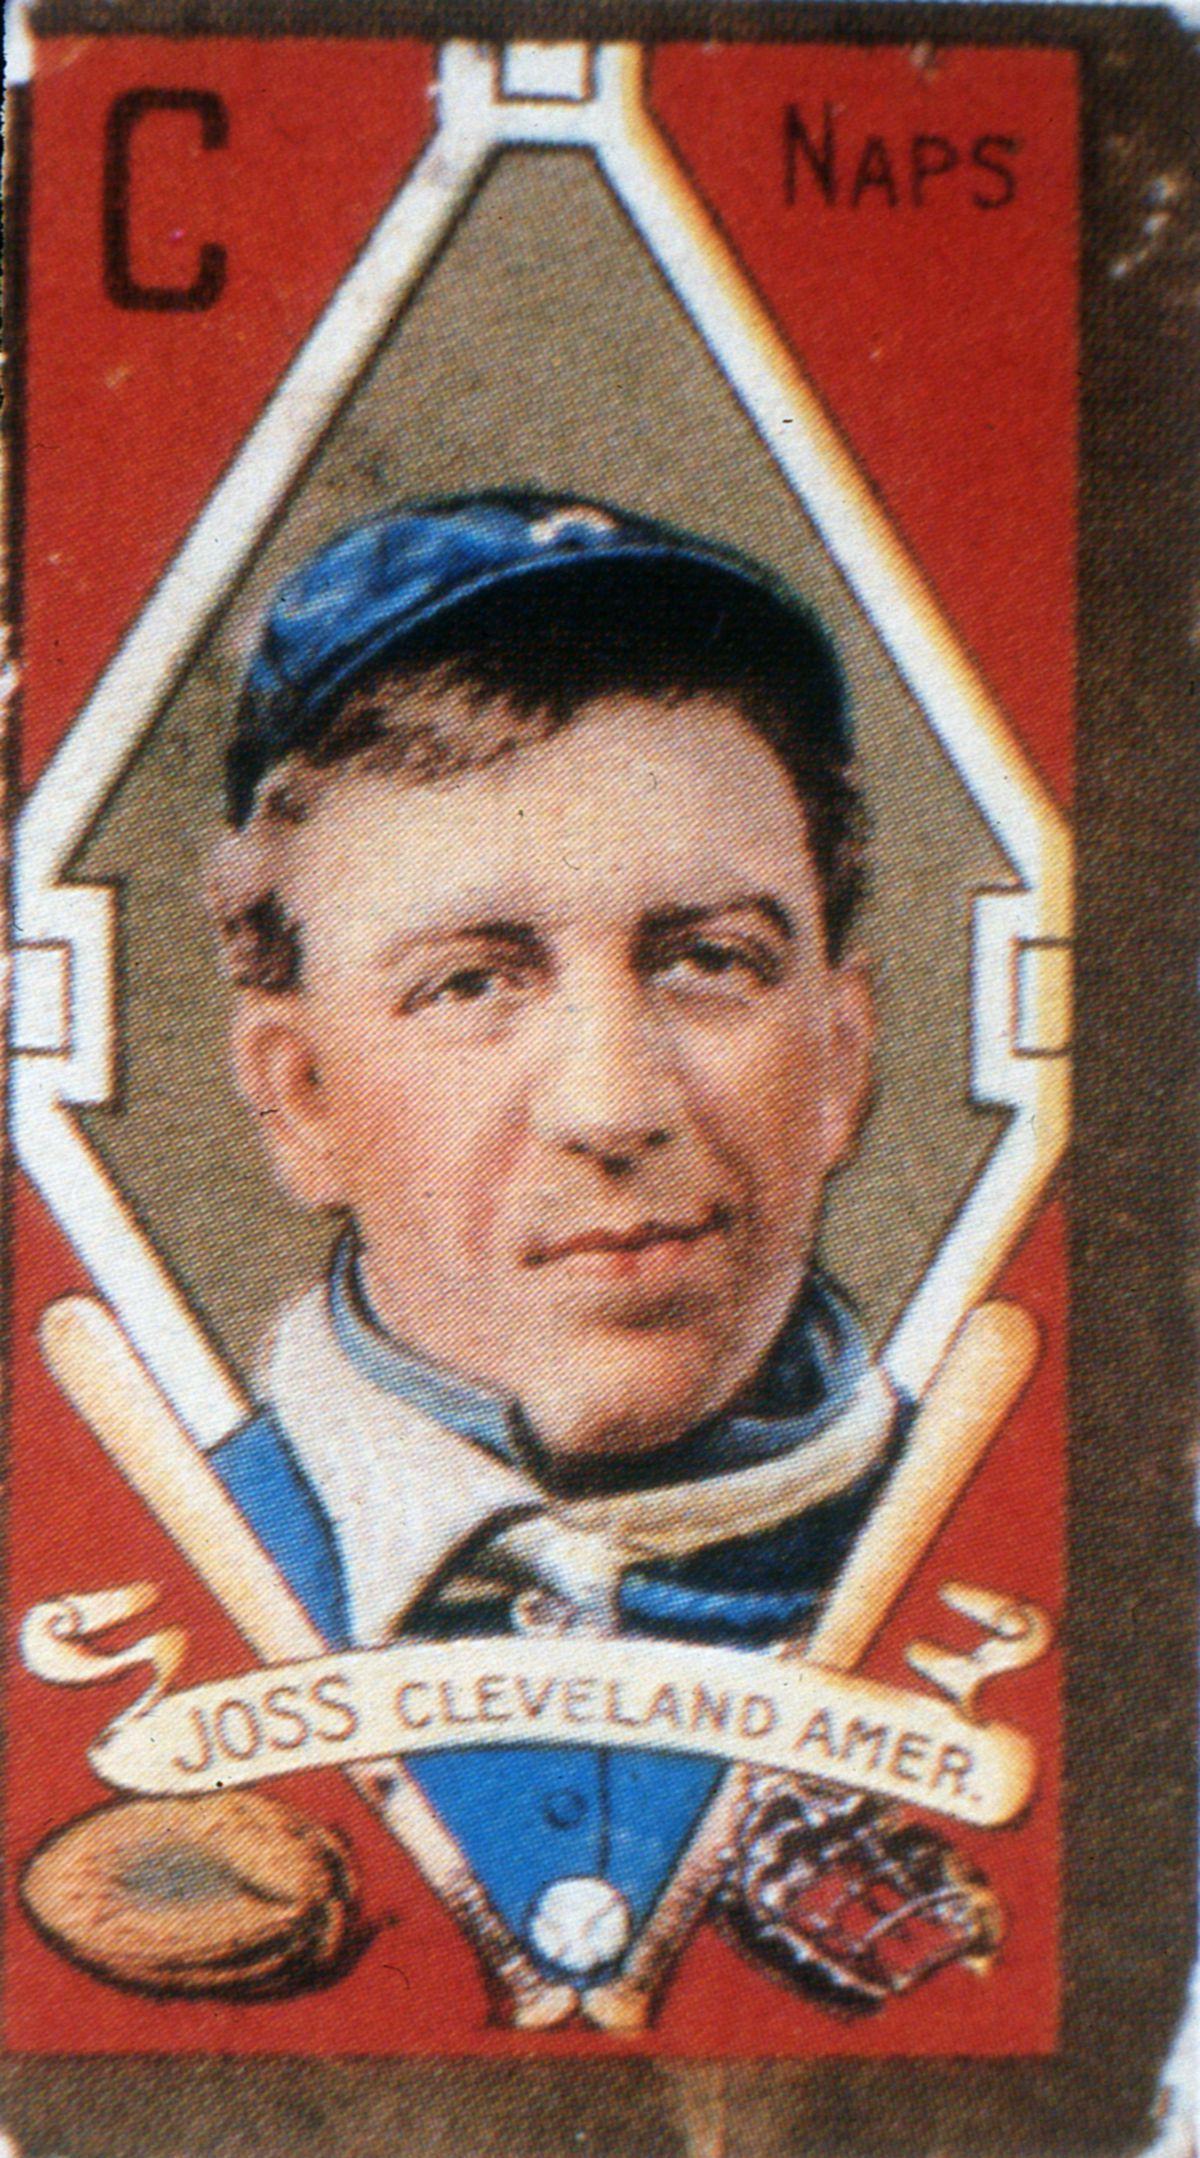 Addie Joss Baseball Card